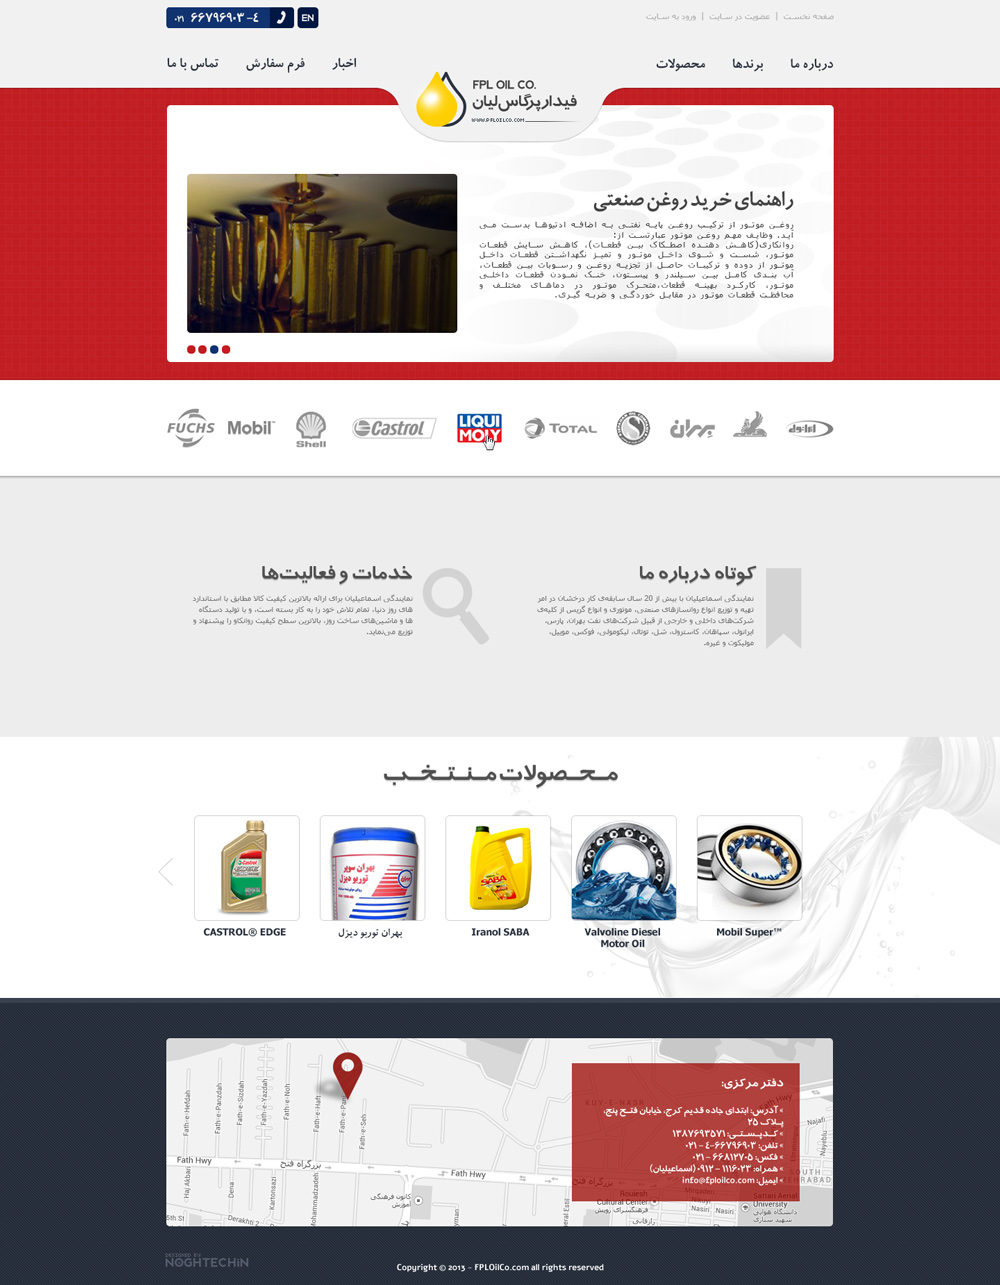 FPL Oil Co.